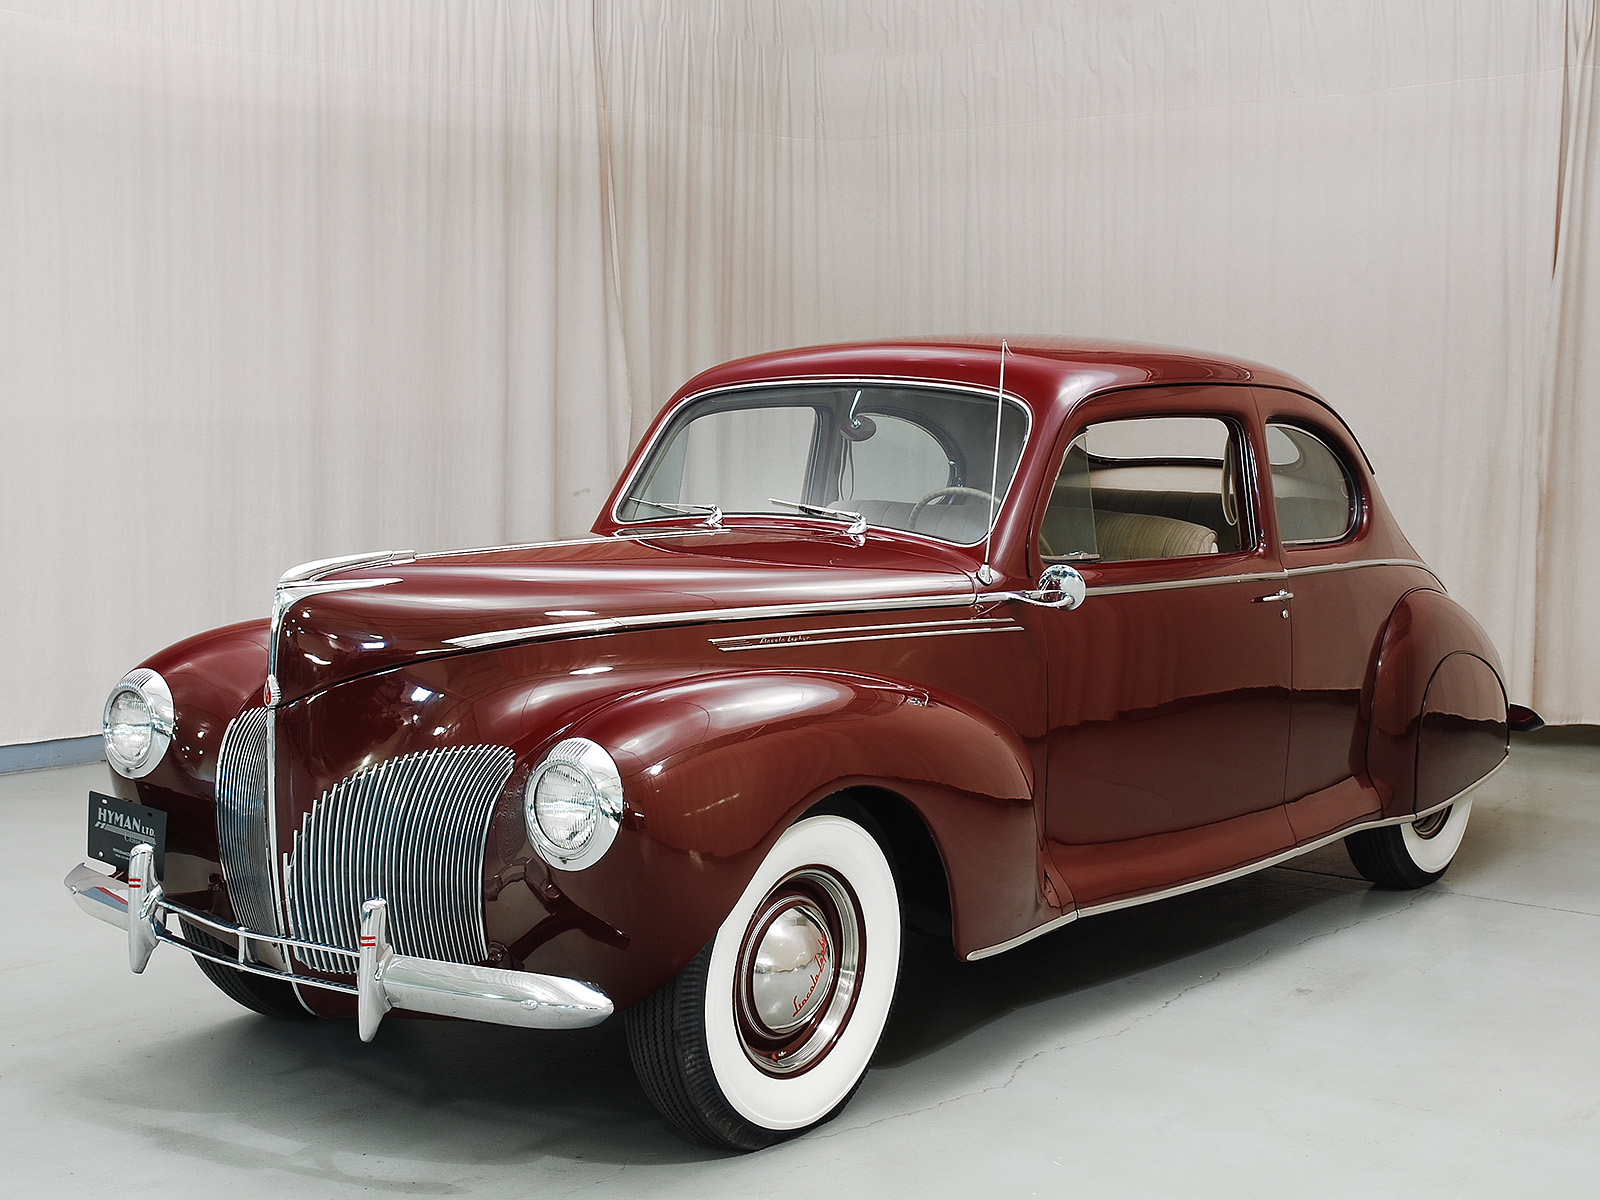 1940 Lincoln Zephyr Coupe Hyman Ltd Classic Cars